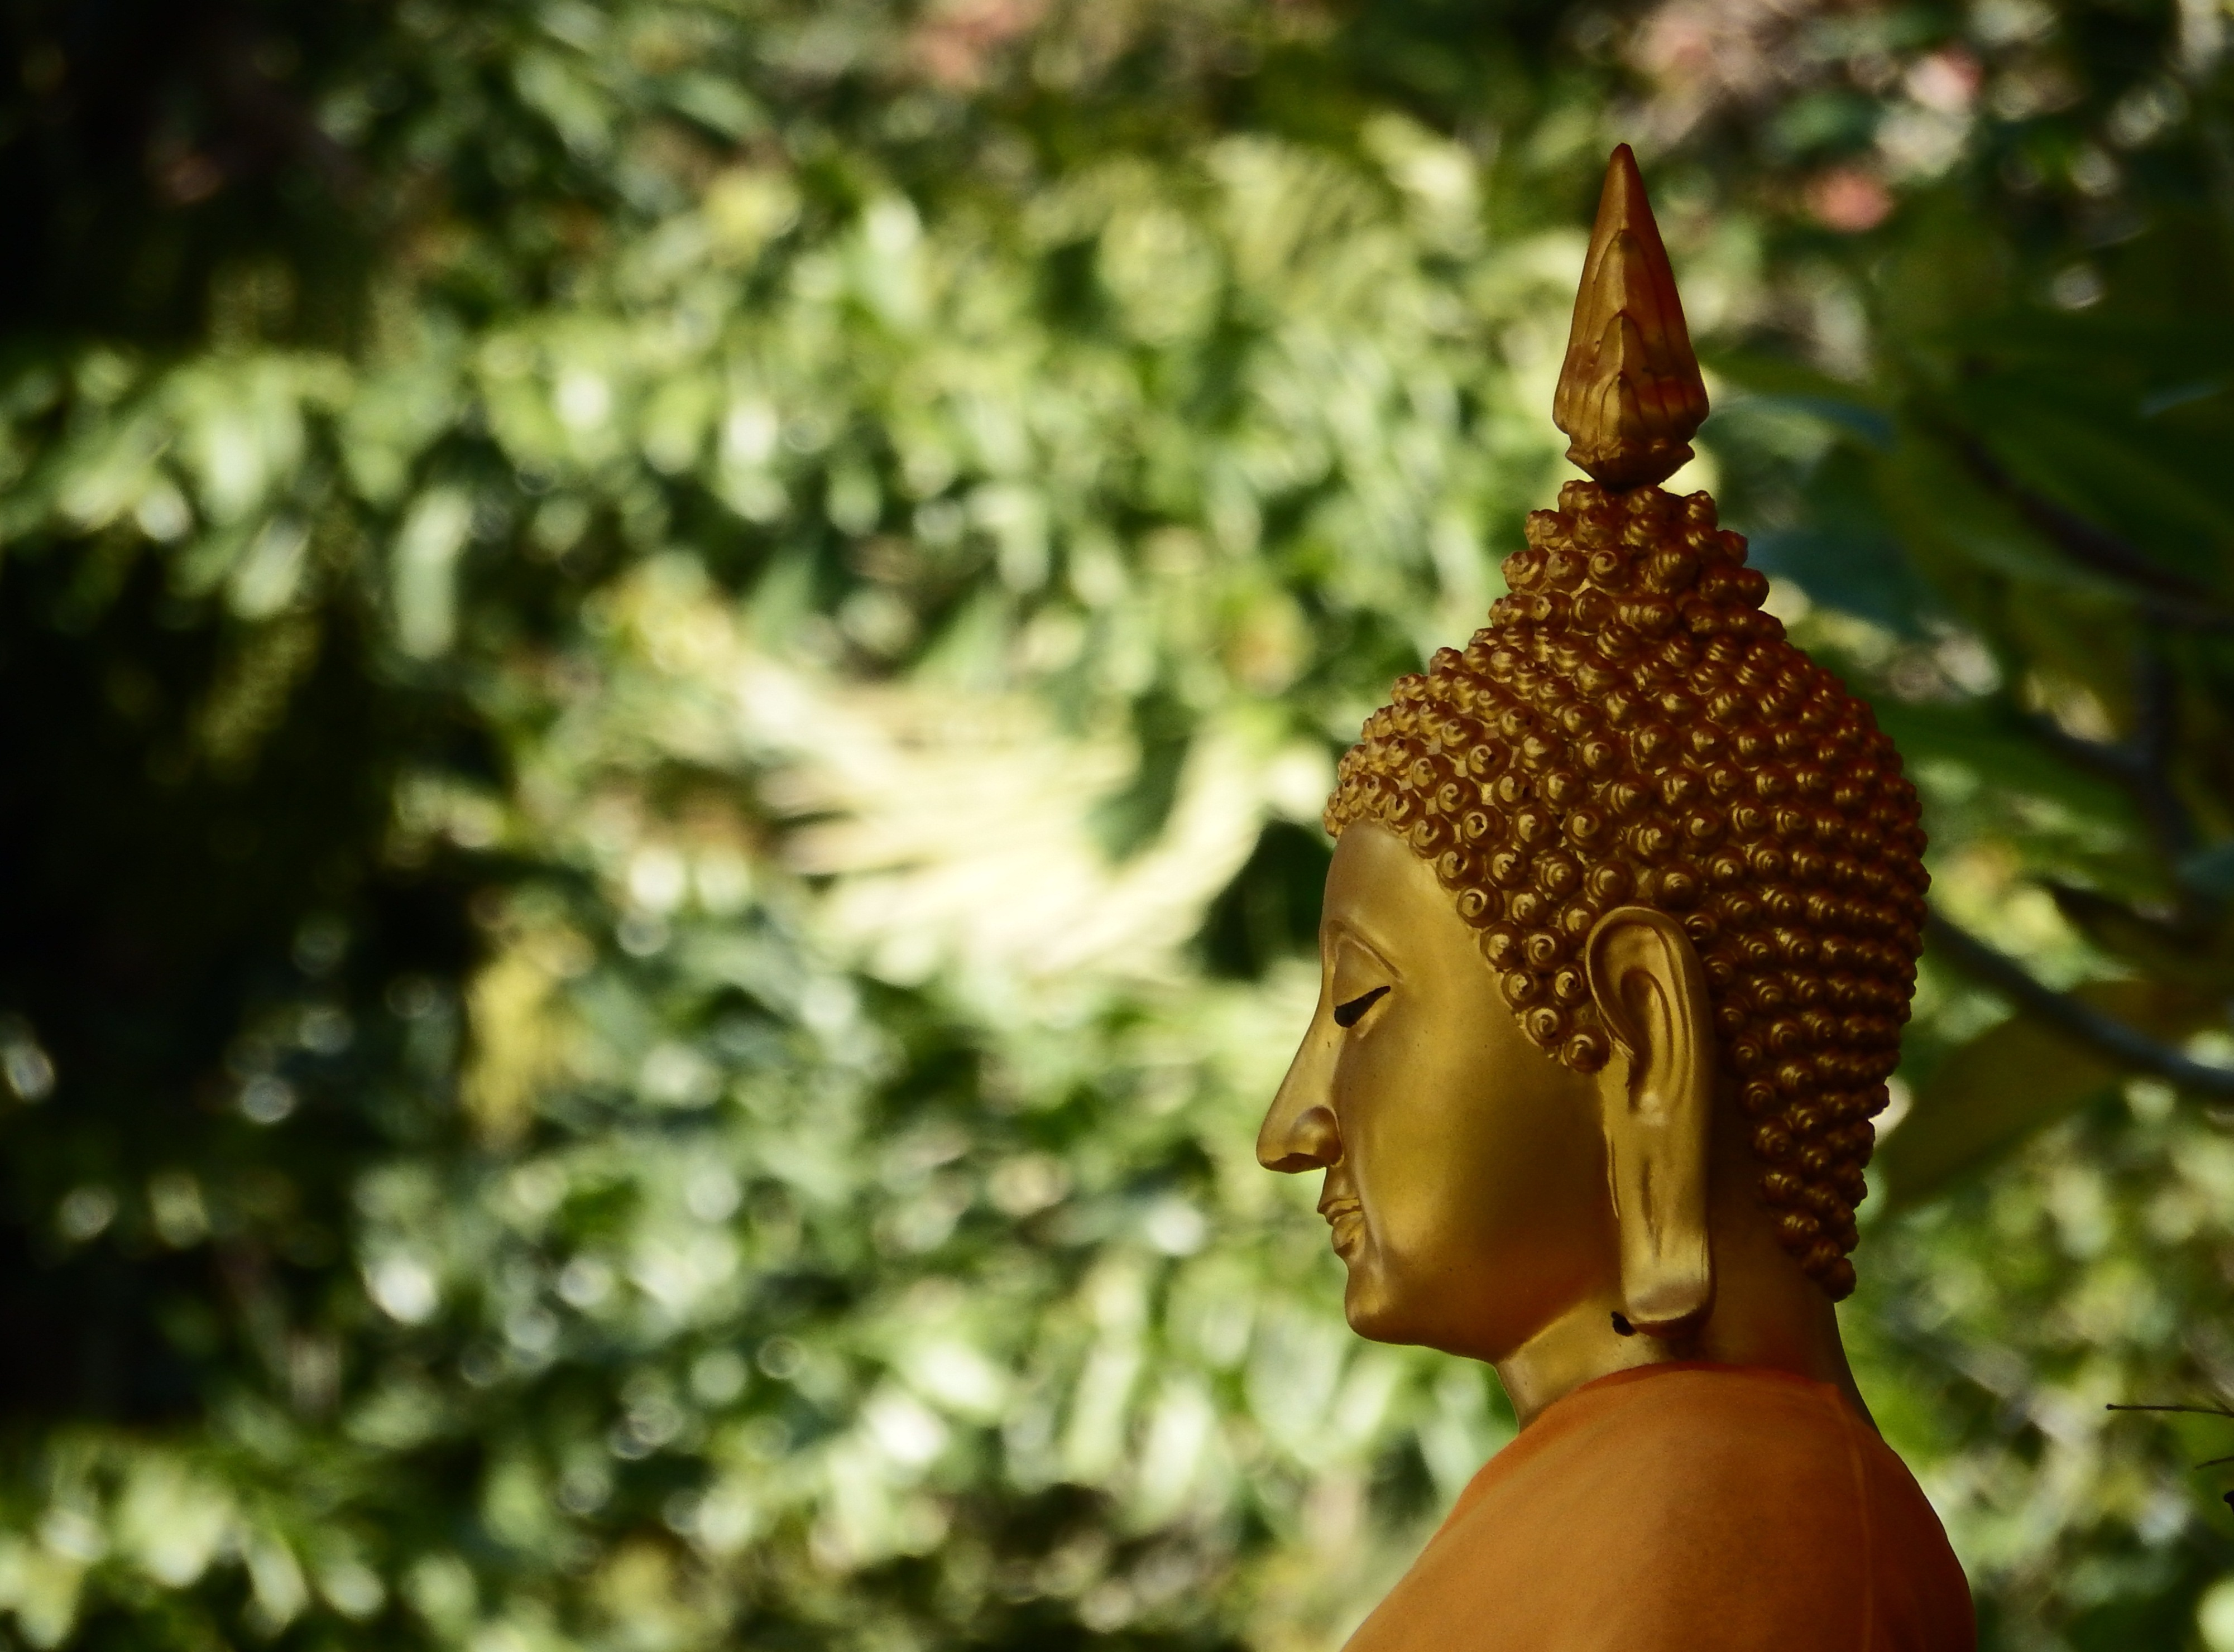 Golden Buddha Face, Asia, Buddha, Yoga, Wisdom, HQ Photo